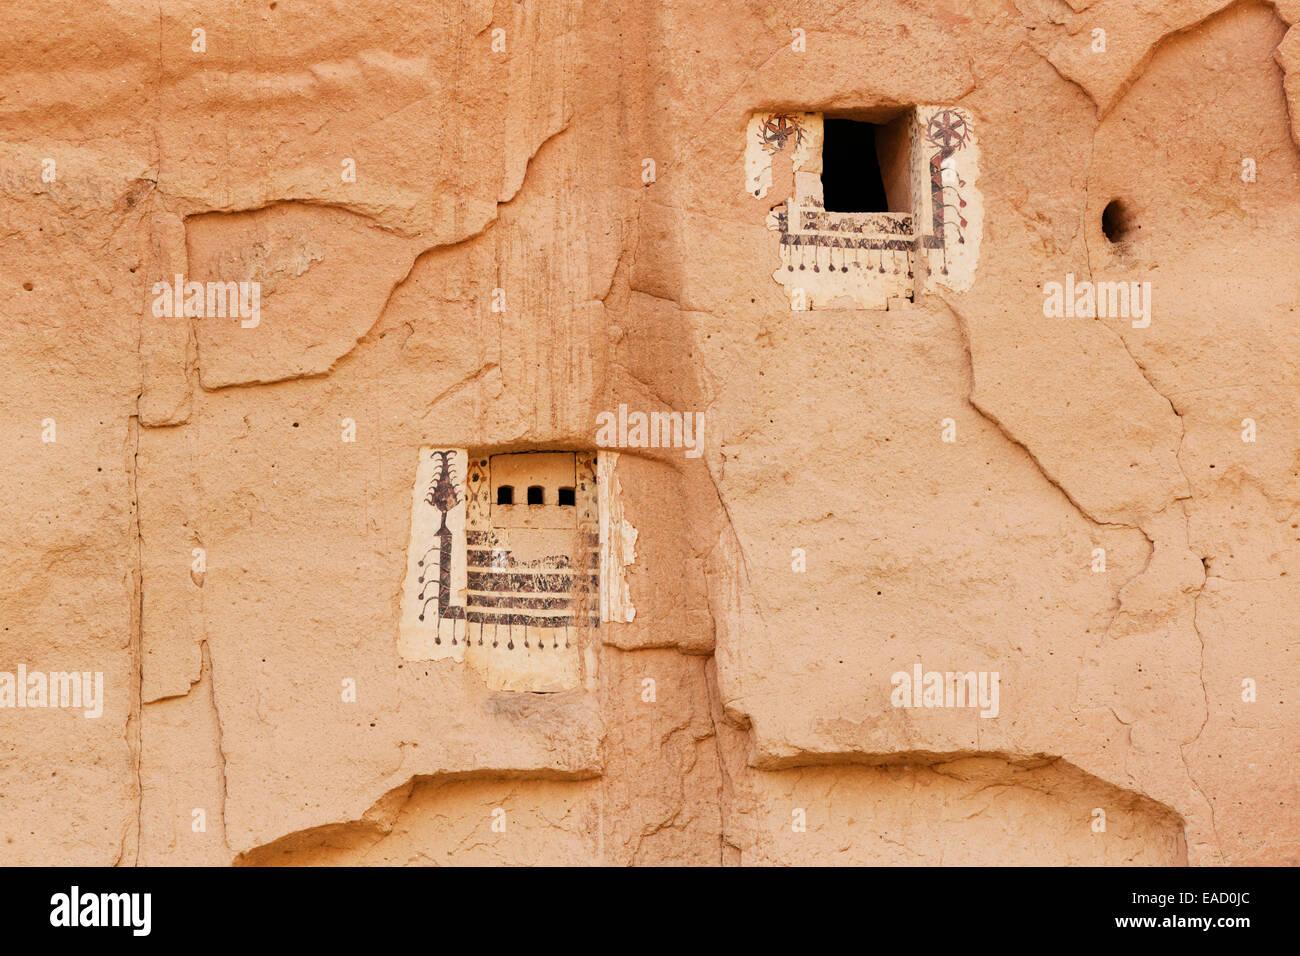 Dovecote, Zelve open-air museum, Göreme National Park, Cappadocia, Central Anatolia Region, Anatolia, Turkey - Stock Image